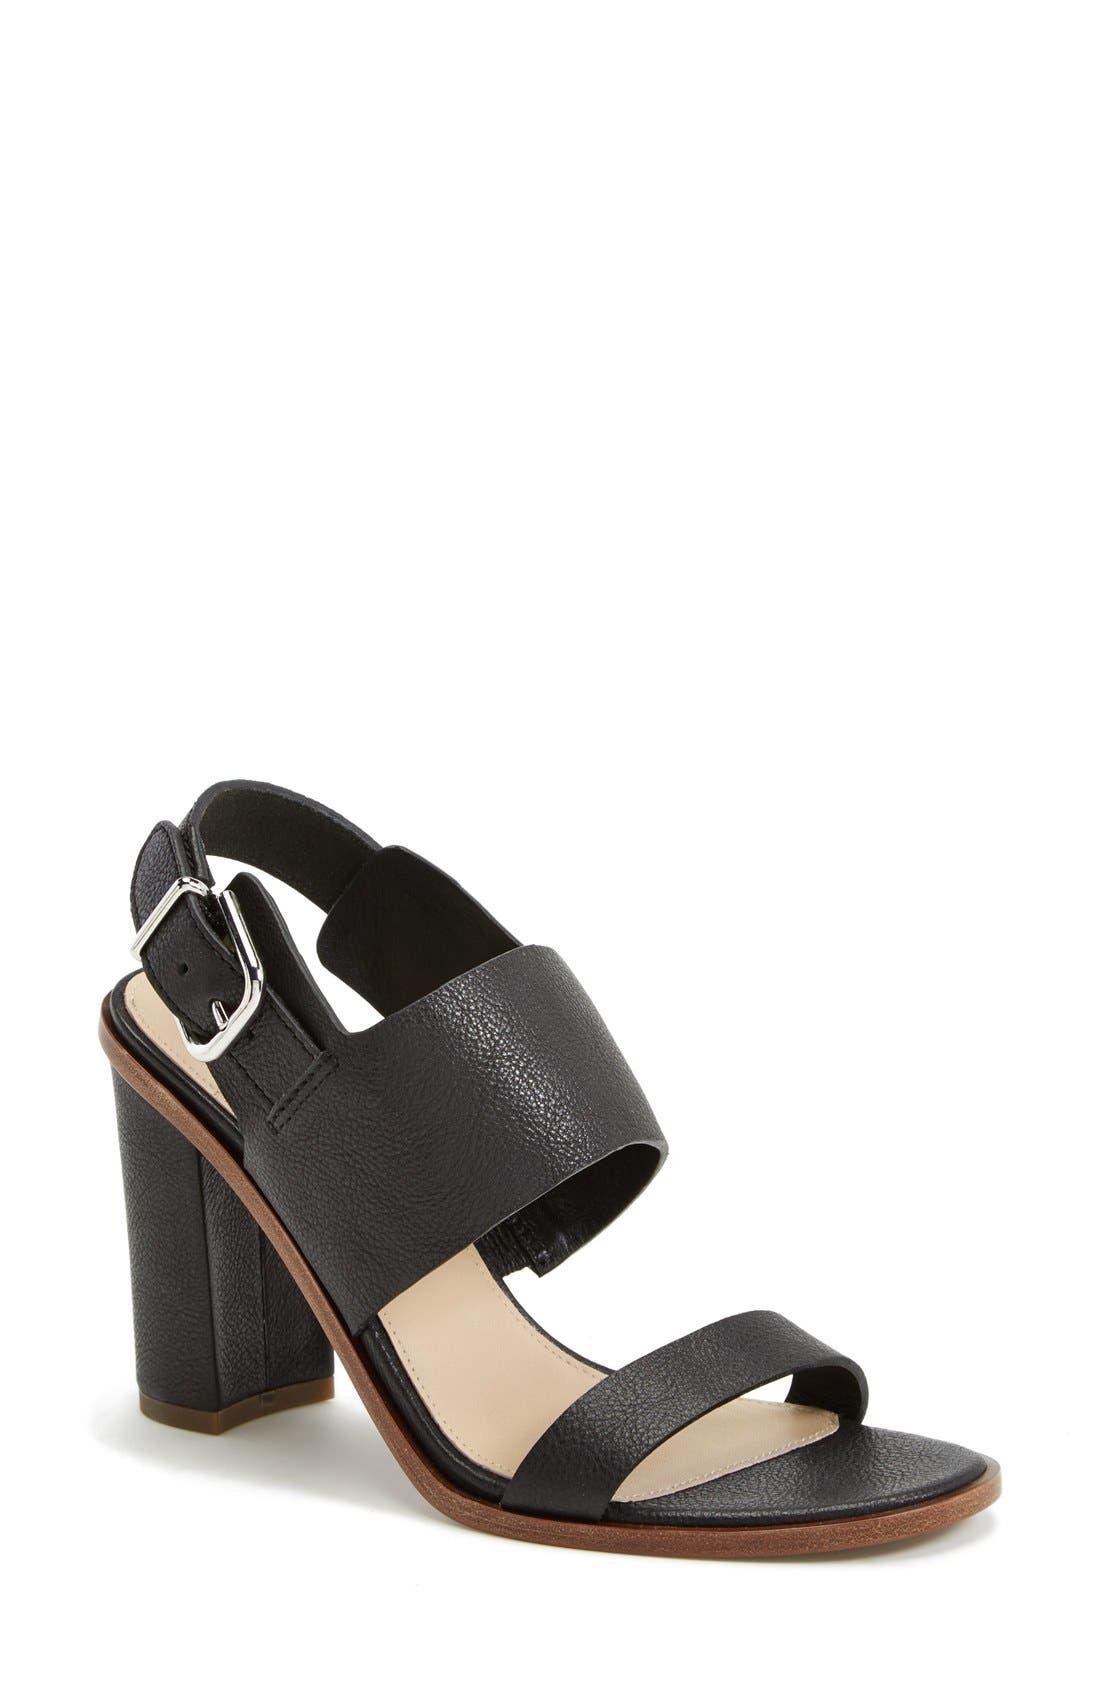 VIA SPIGA 'Baris' Leather Slingback Sandal, Main, color, 001